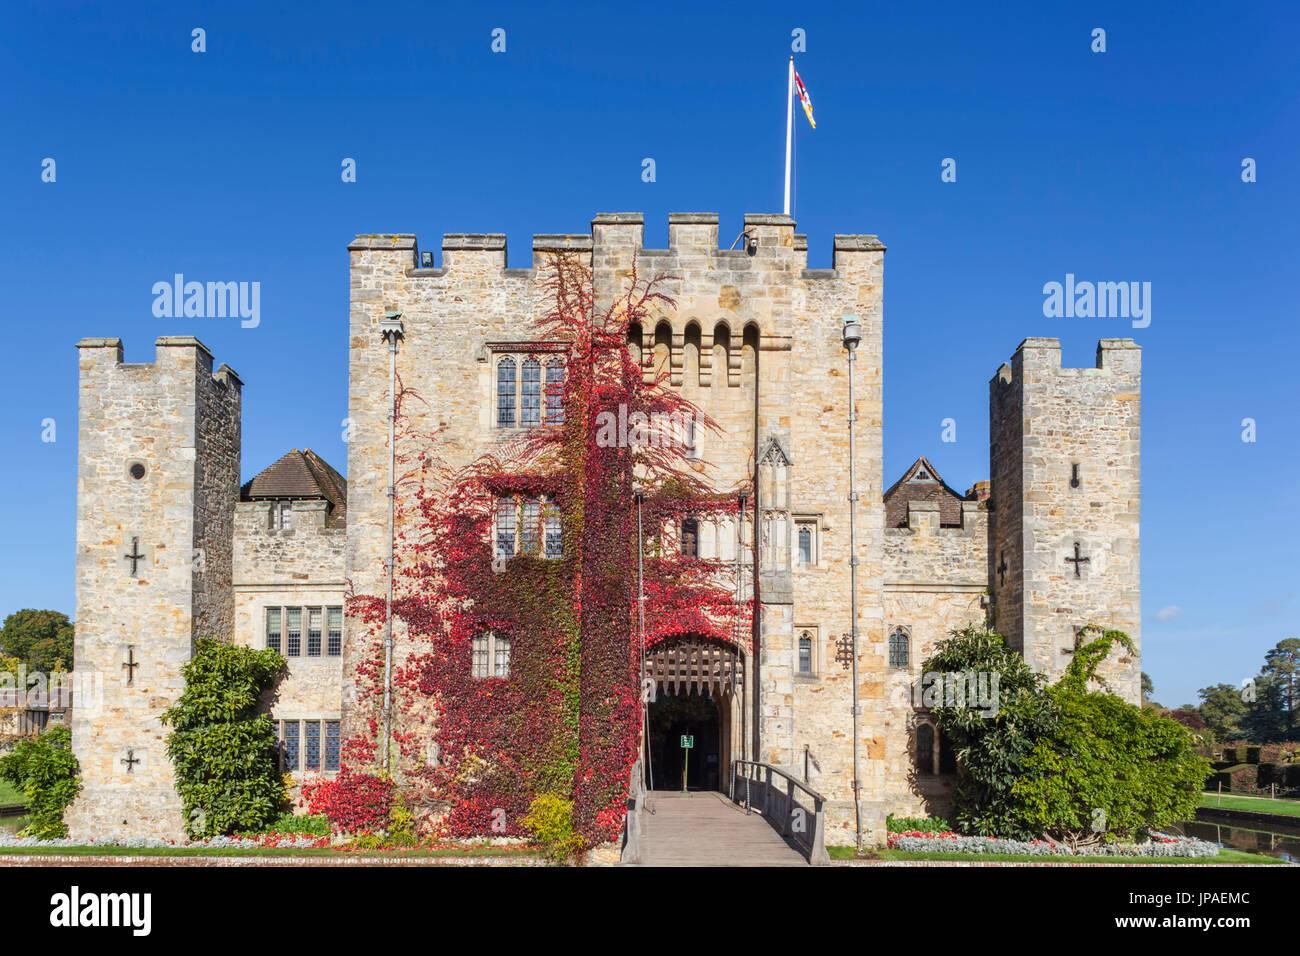 England, Kent, Edenbridge, Hever Castle - Stock Image